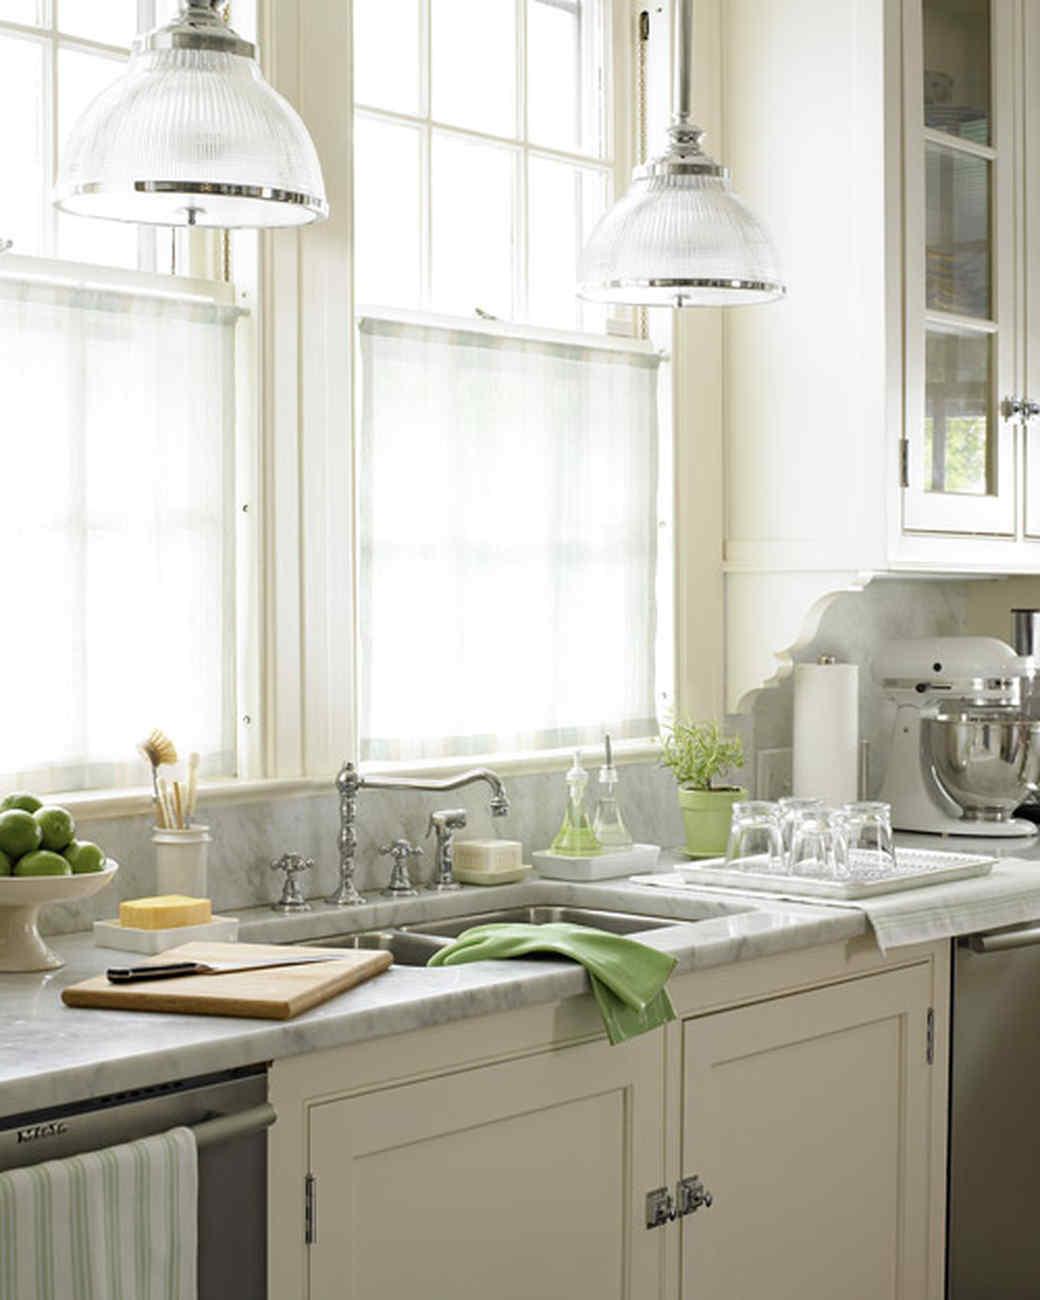 Healthy Kitchen Habits